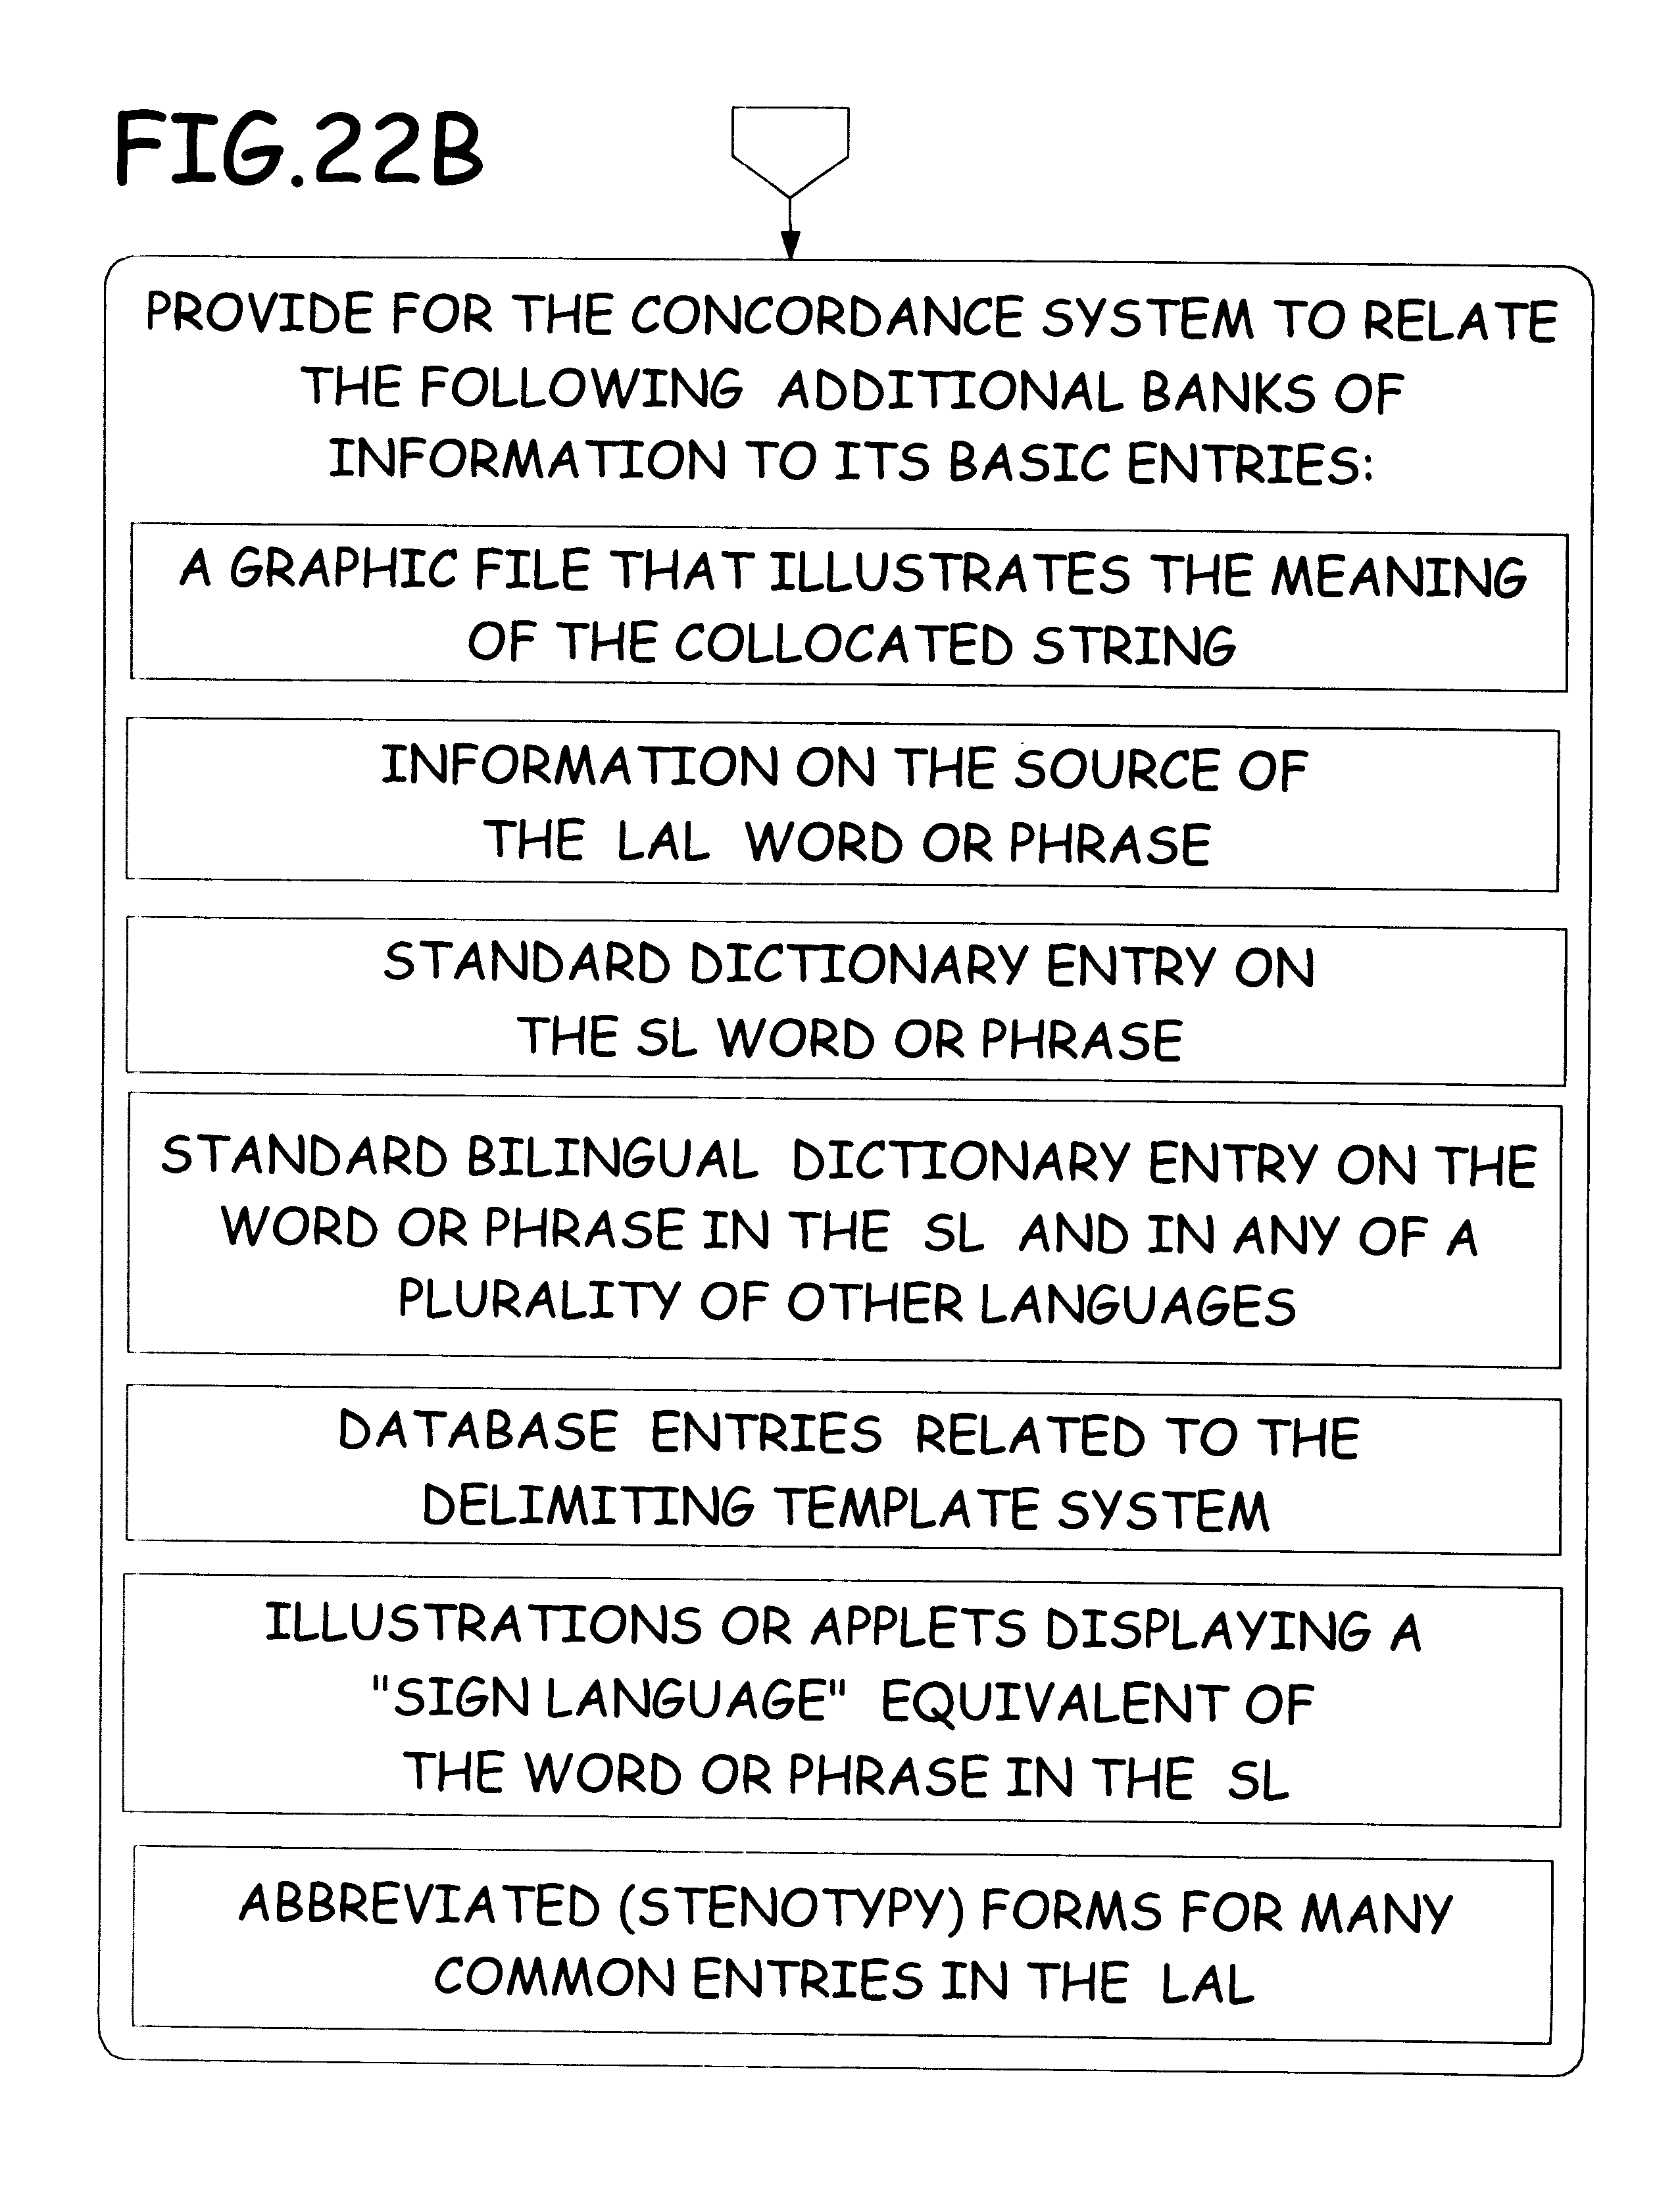 Patent US 6,275,789 B1